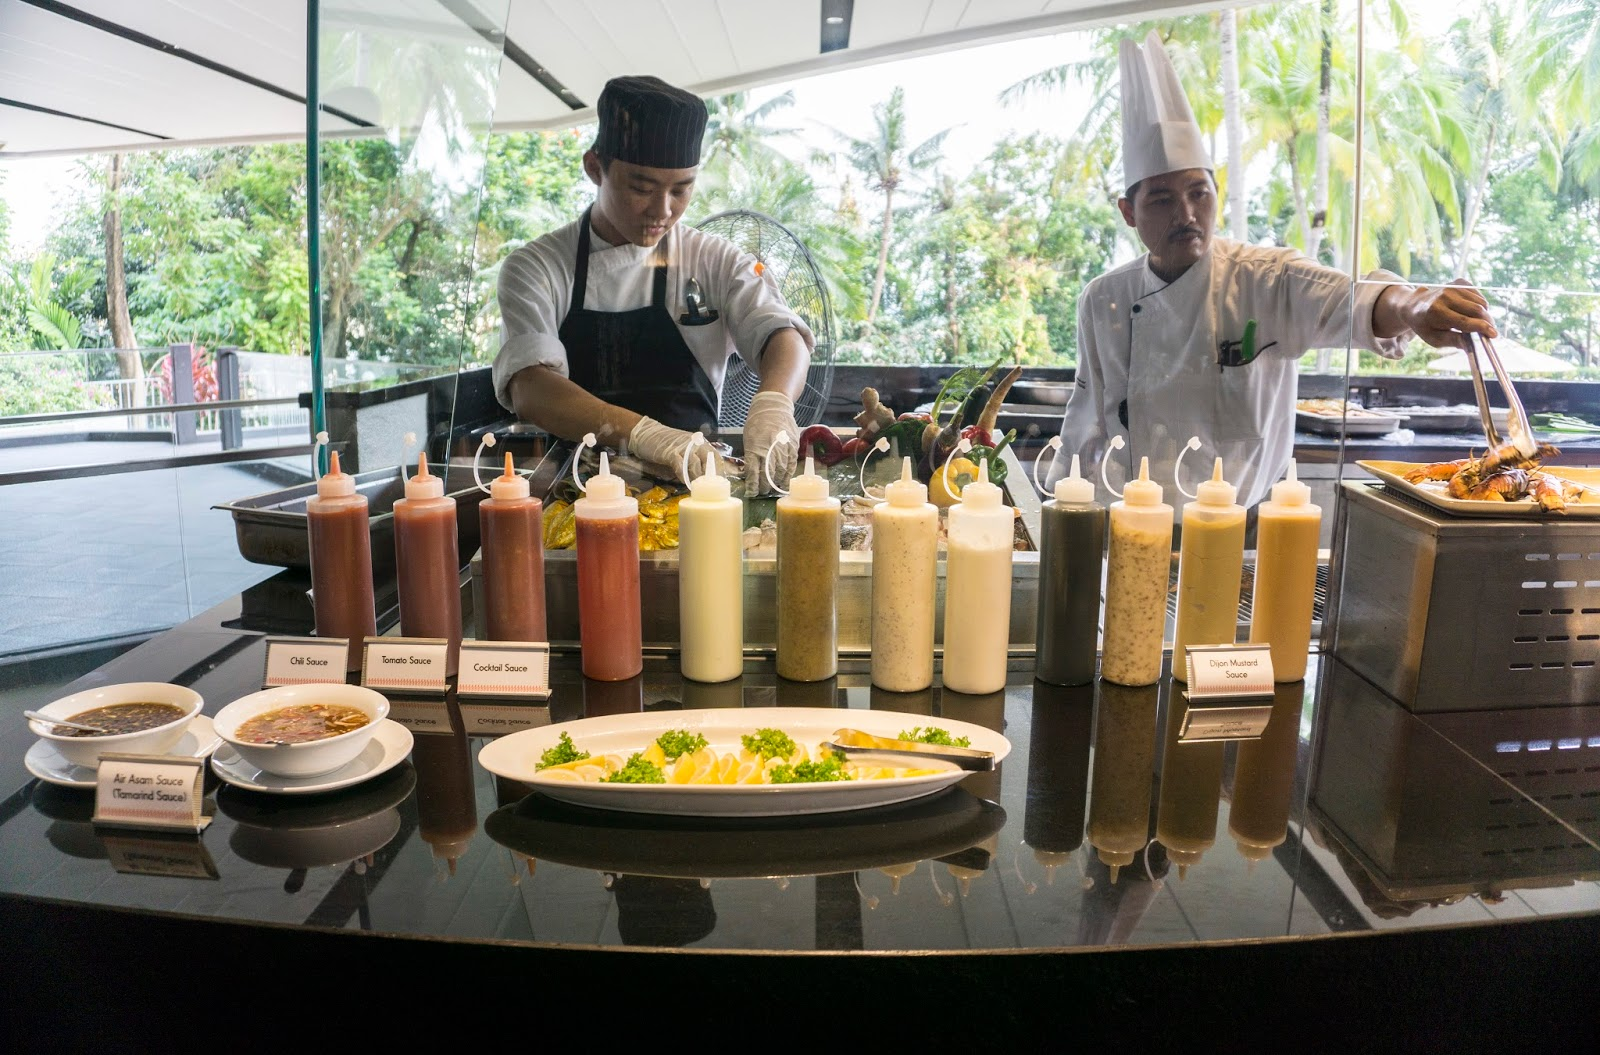 Seafood Dilight Dinner Buffet Nada Lama Equotorial Hotel Penang